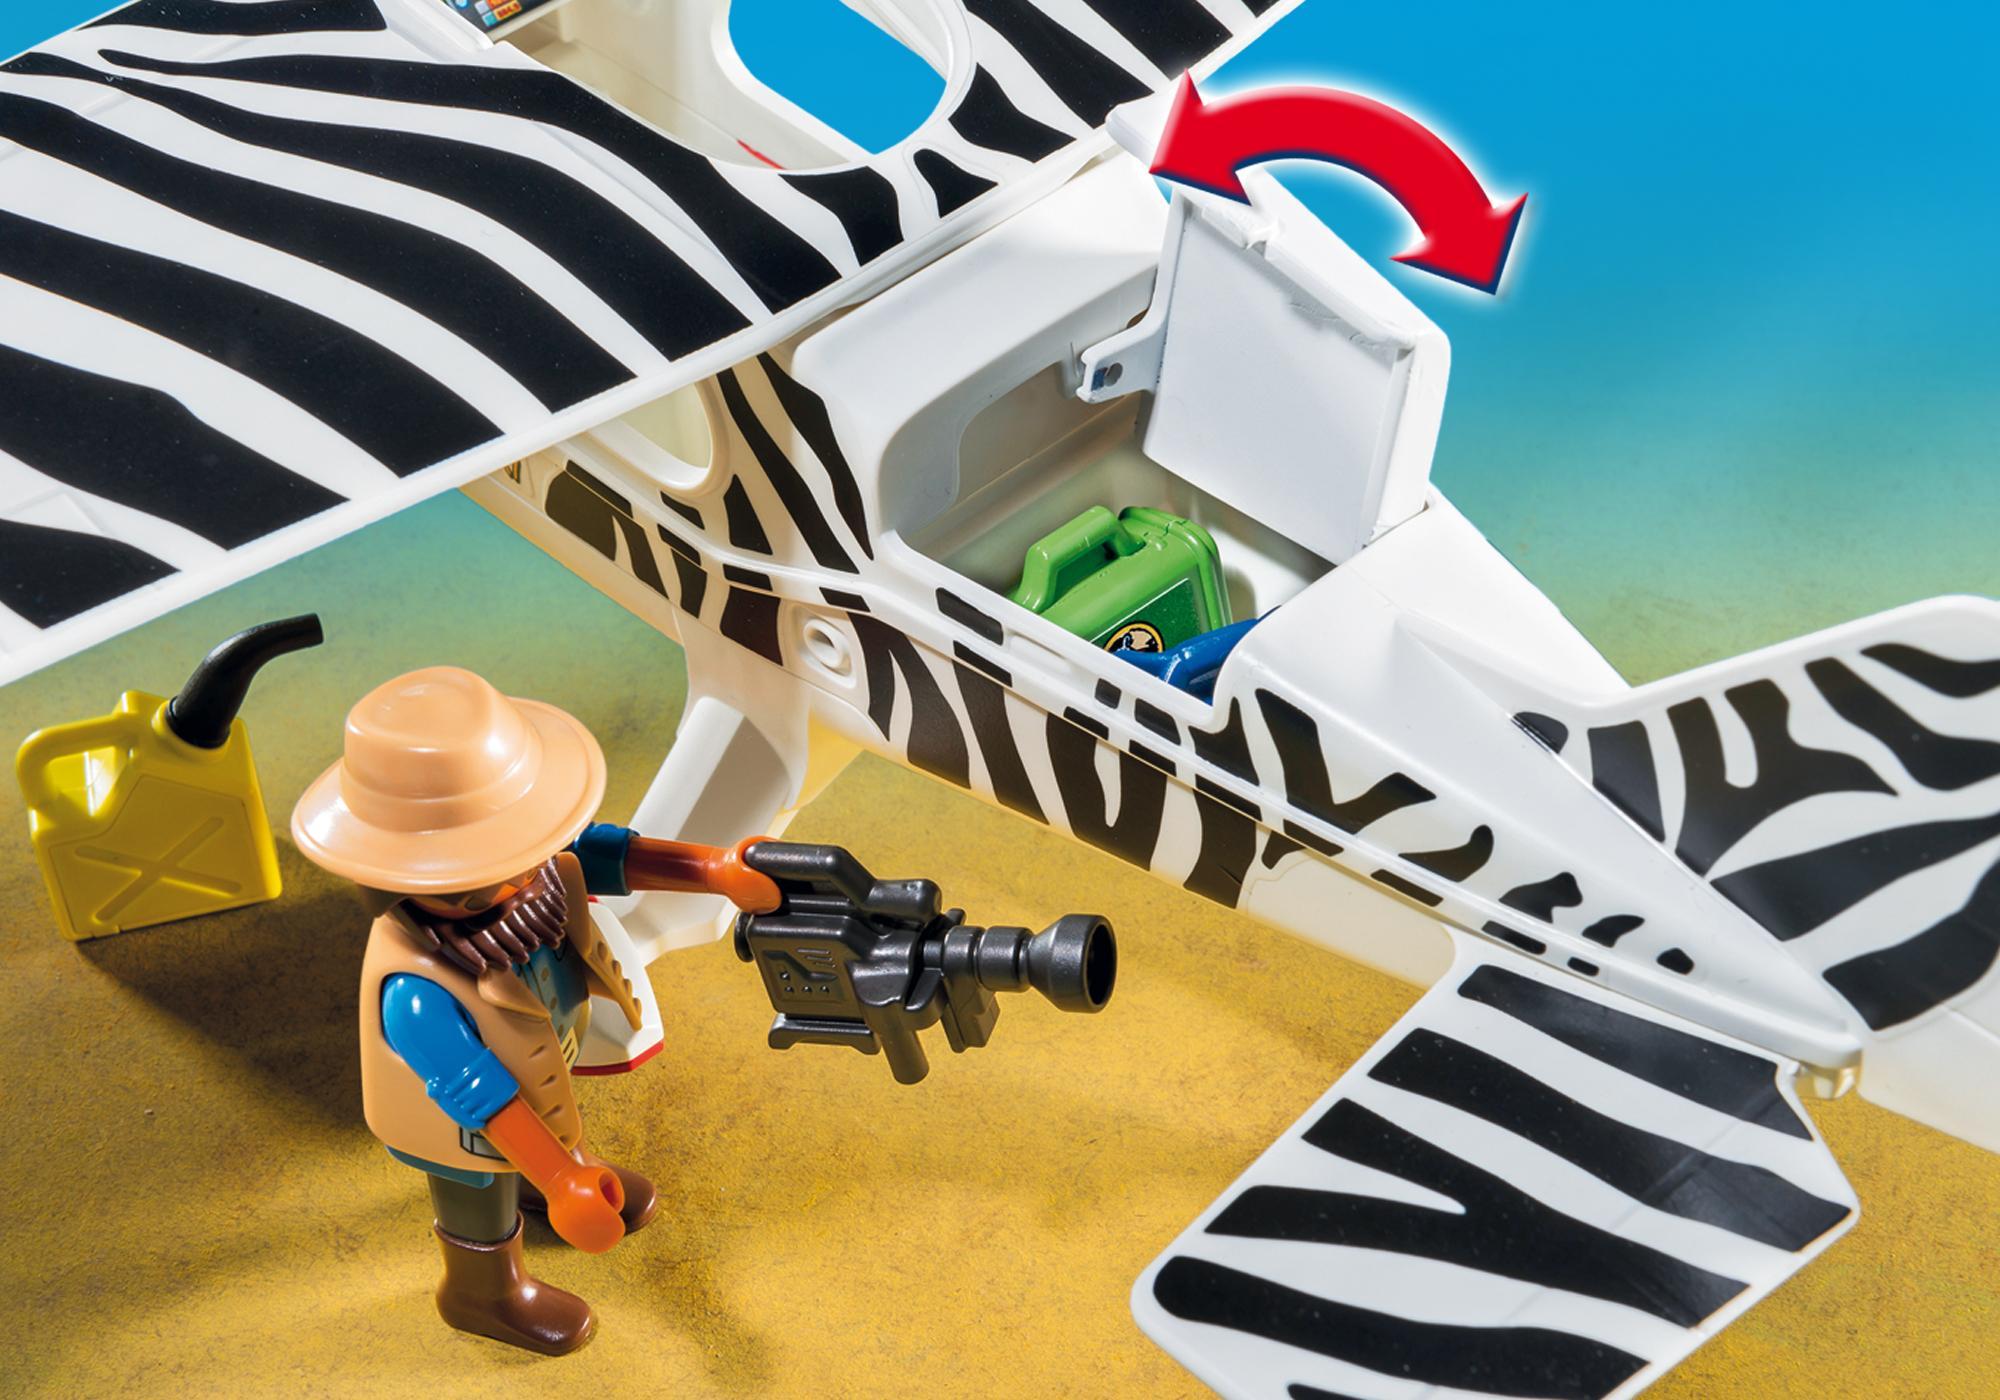 http://media.playmobil.com/i/playmobil/6938_product_extra1/Safari Plane